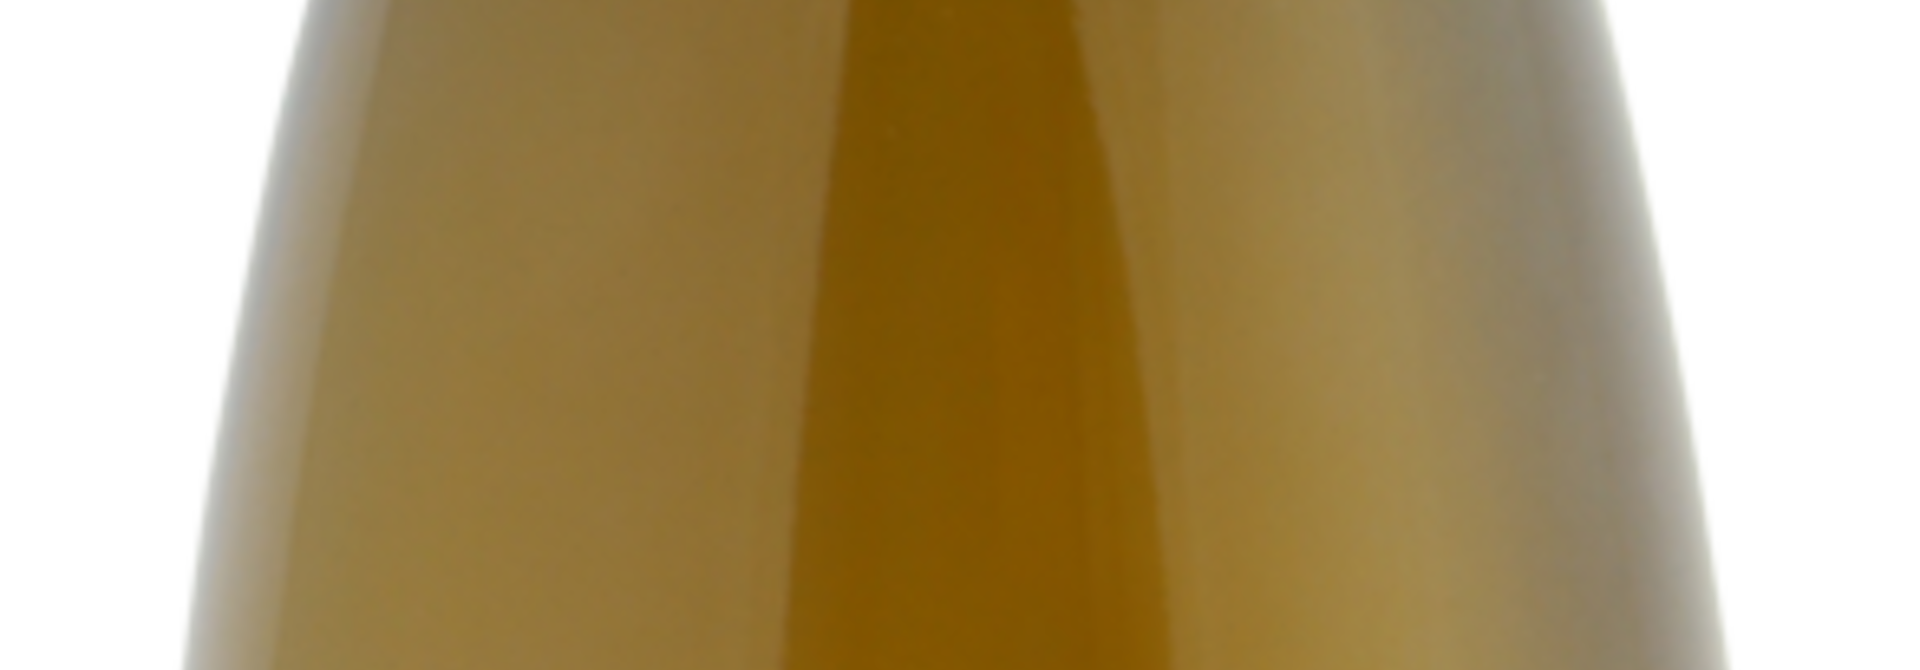 Domaine Marcel Deiss Engelgarten 2017